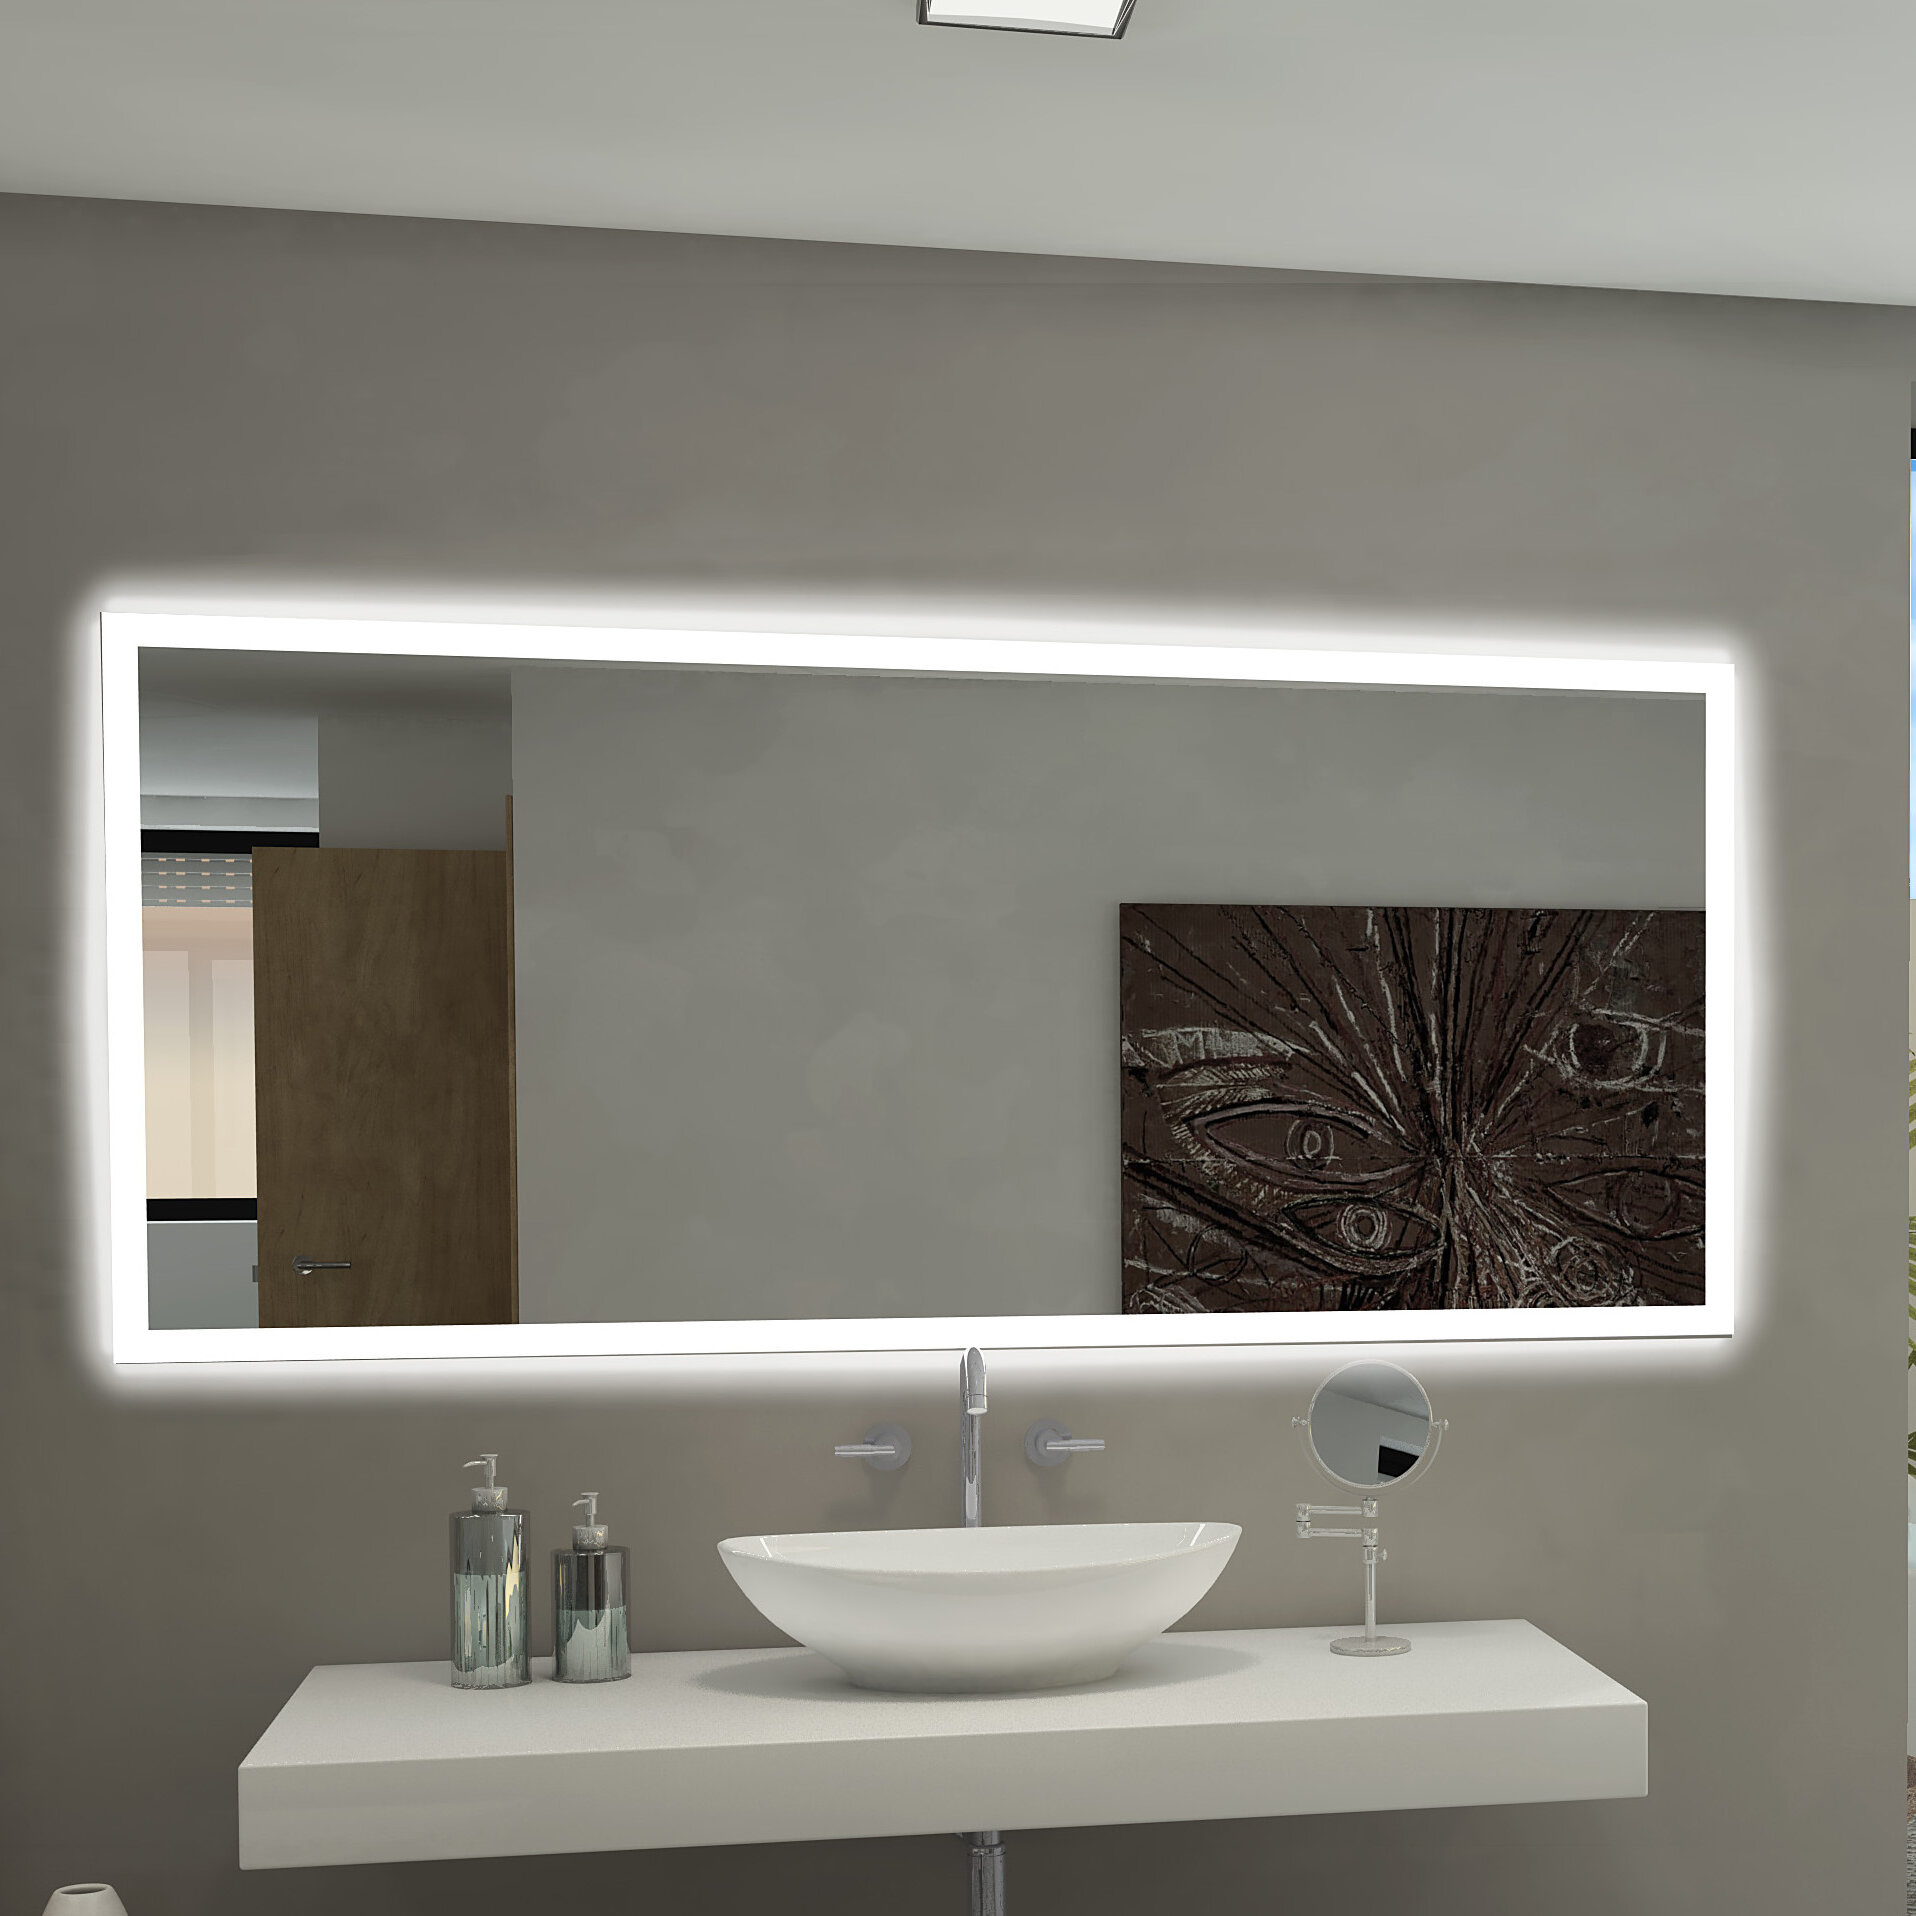 Paris mirror rectangle backlit bathroom vanity wall mirror reviews wayfair